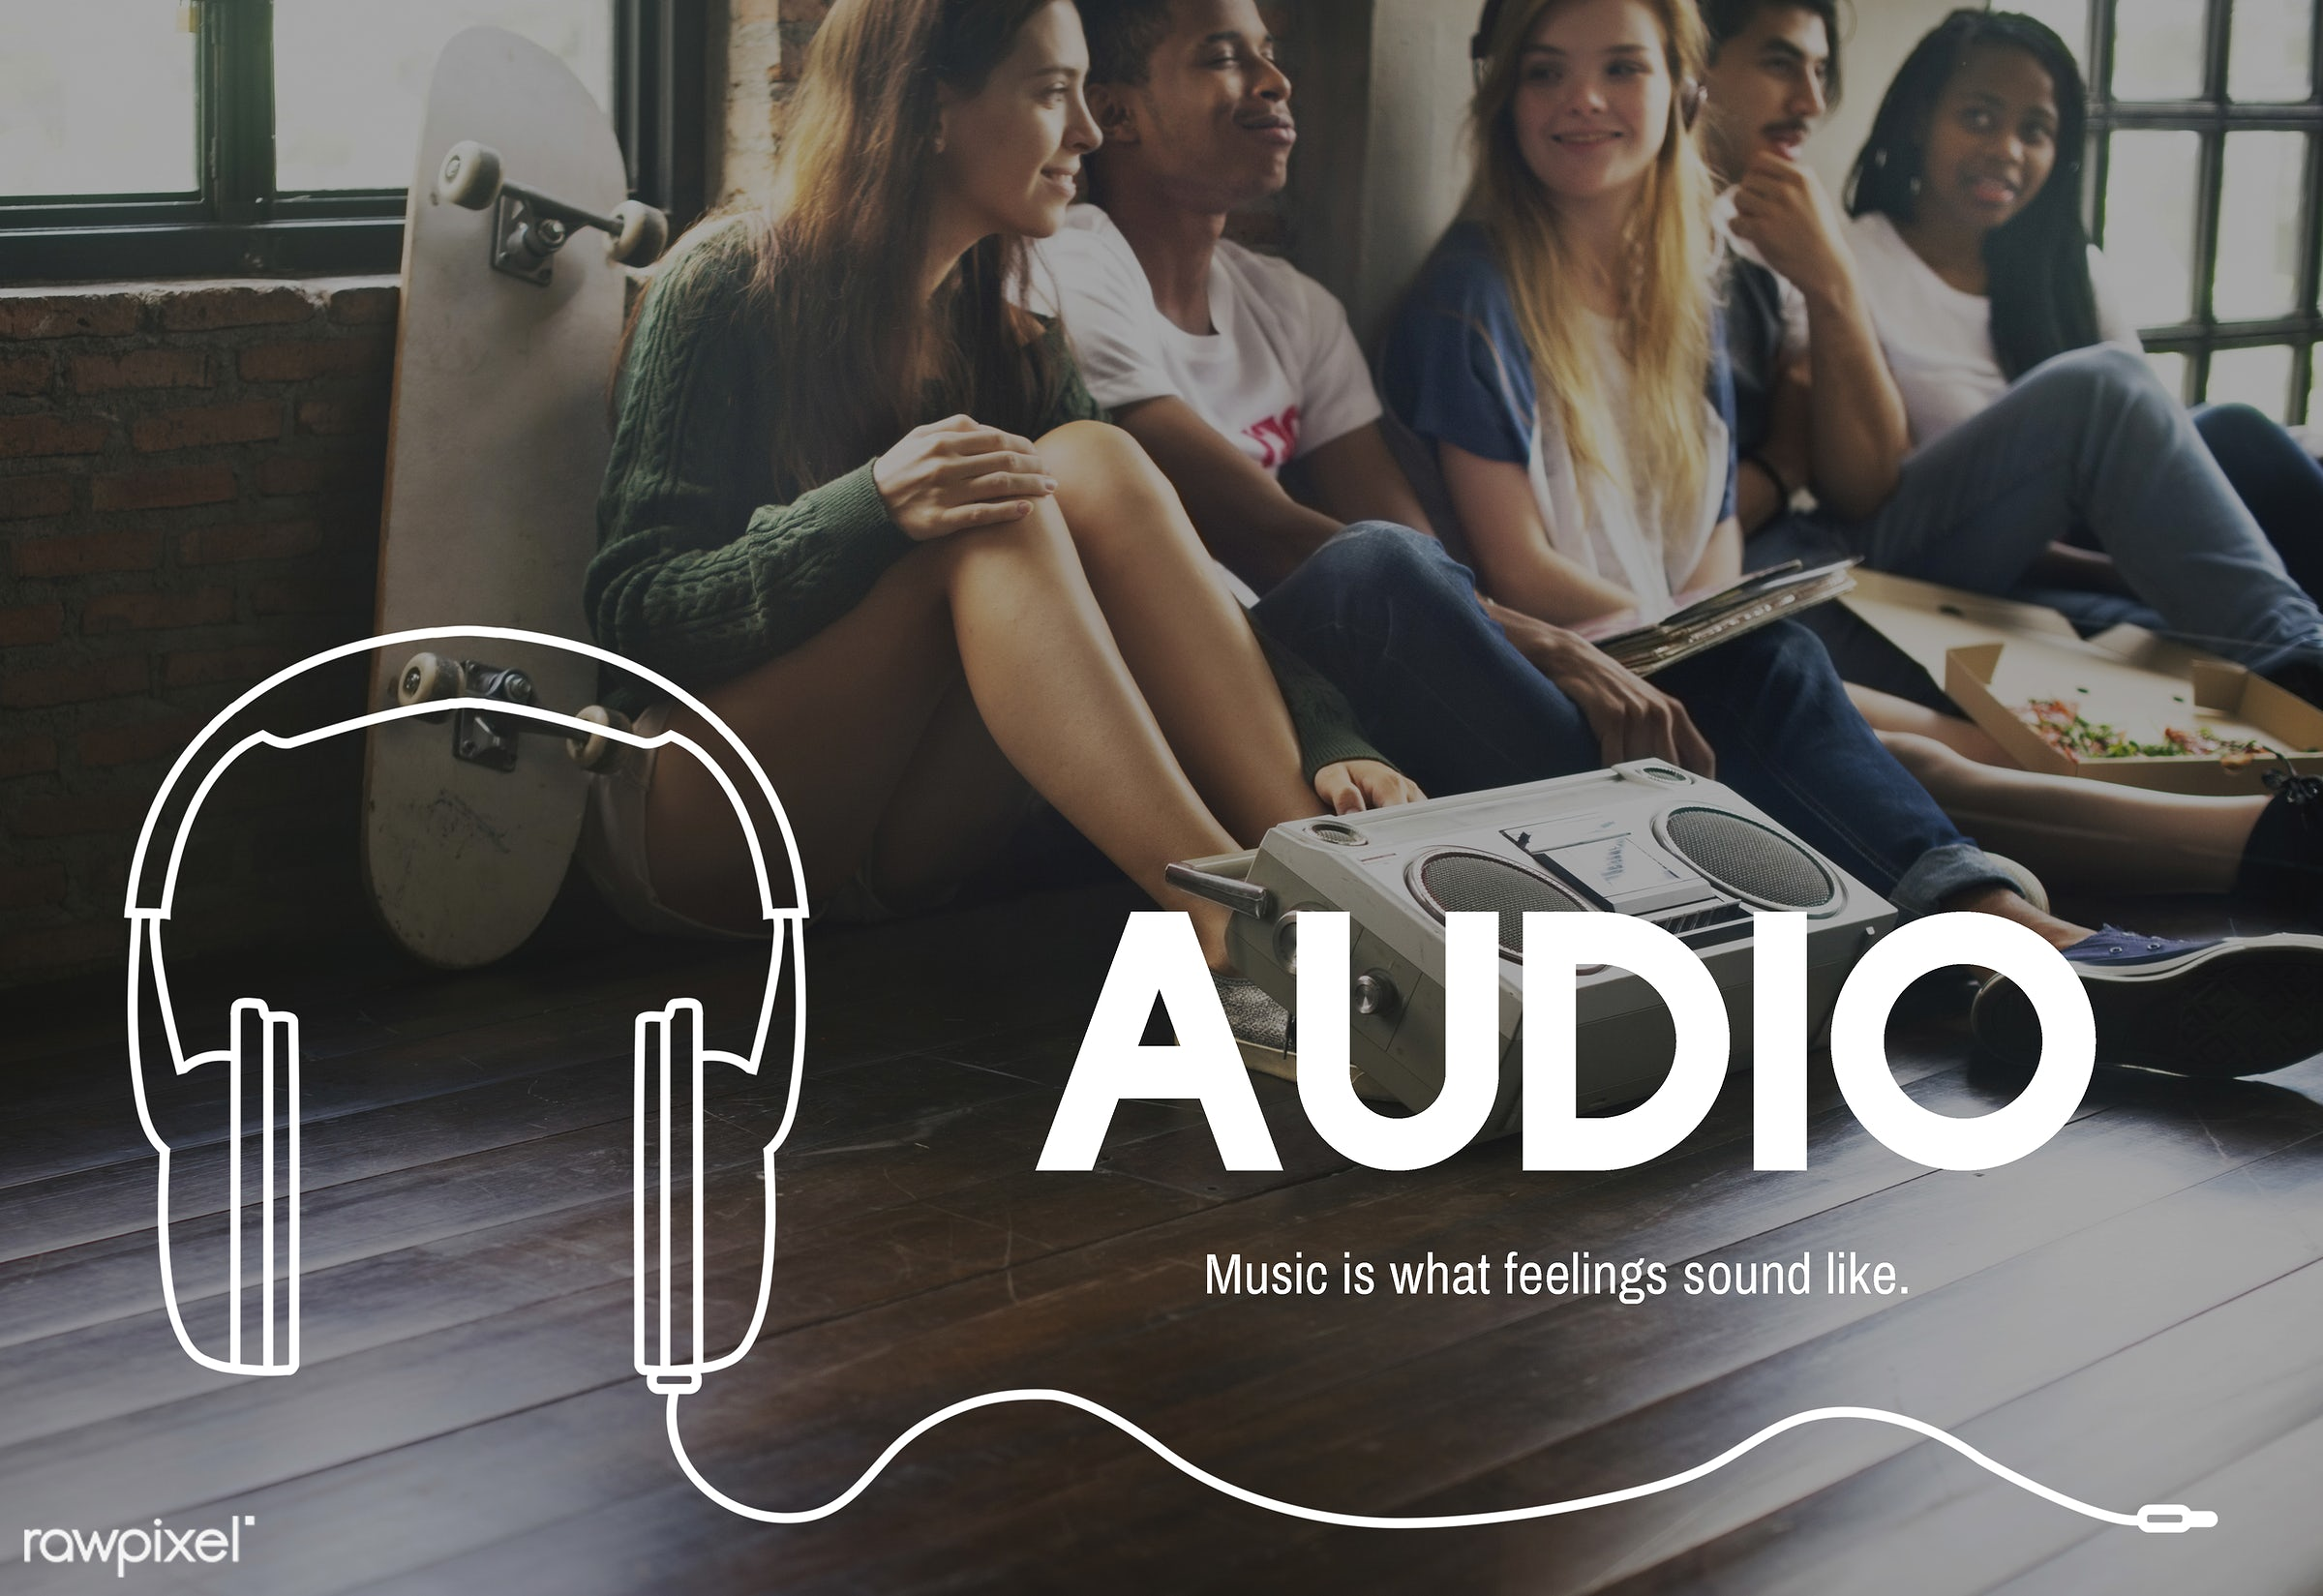 audio, boardcast, digital media, enjoy life, entertain, entertainment, friends, friendship, fun, graphic, hangout, headphone...